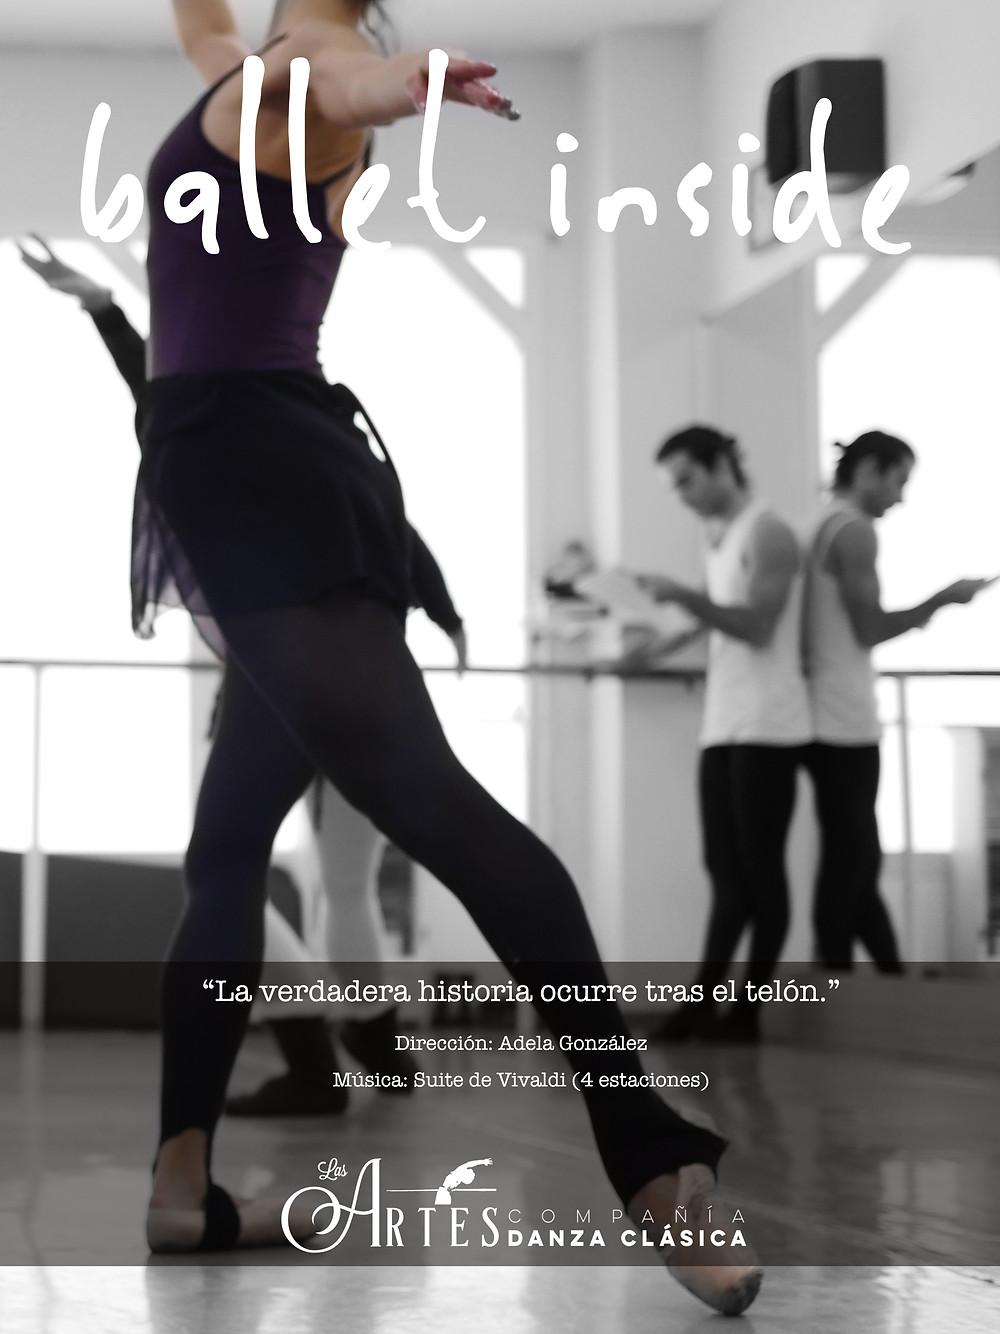 Ballet Inside Comp. Las Artes - Poster Design: MarioGh